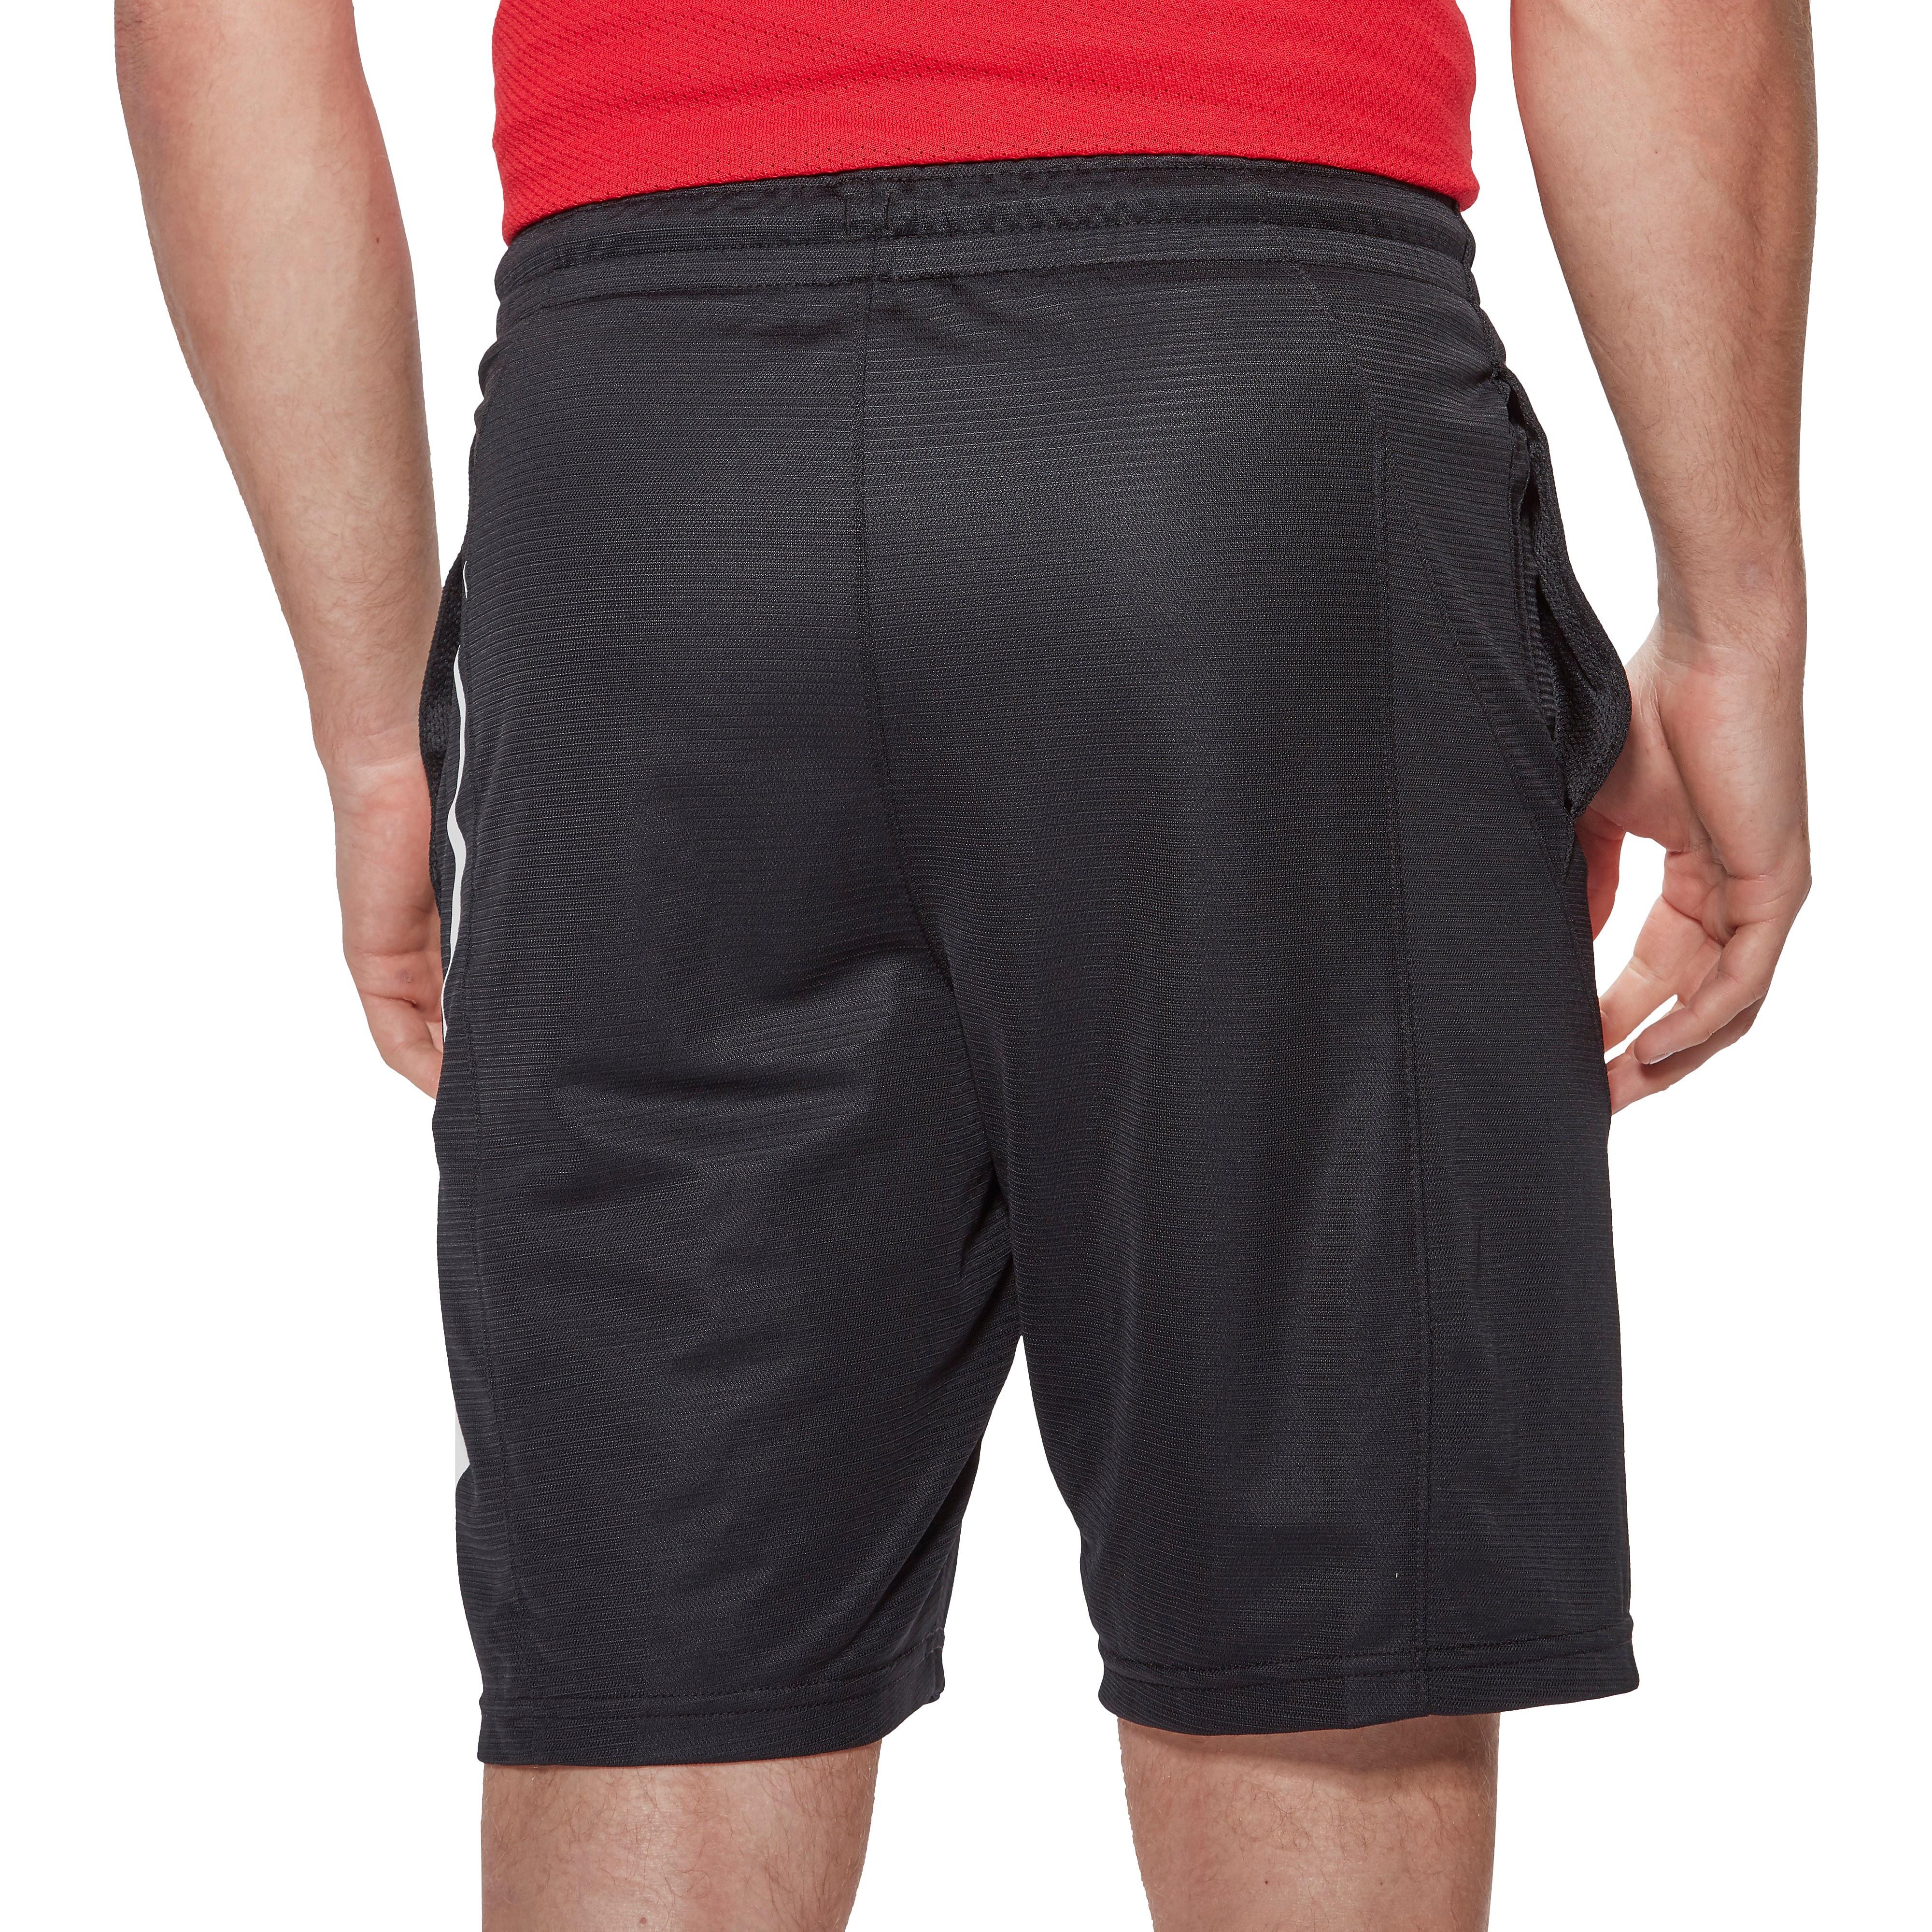 Nike HBR Men's Shorts